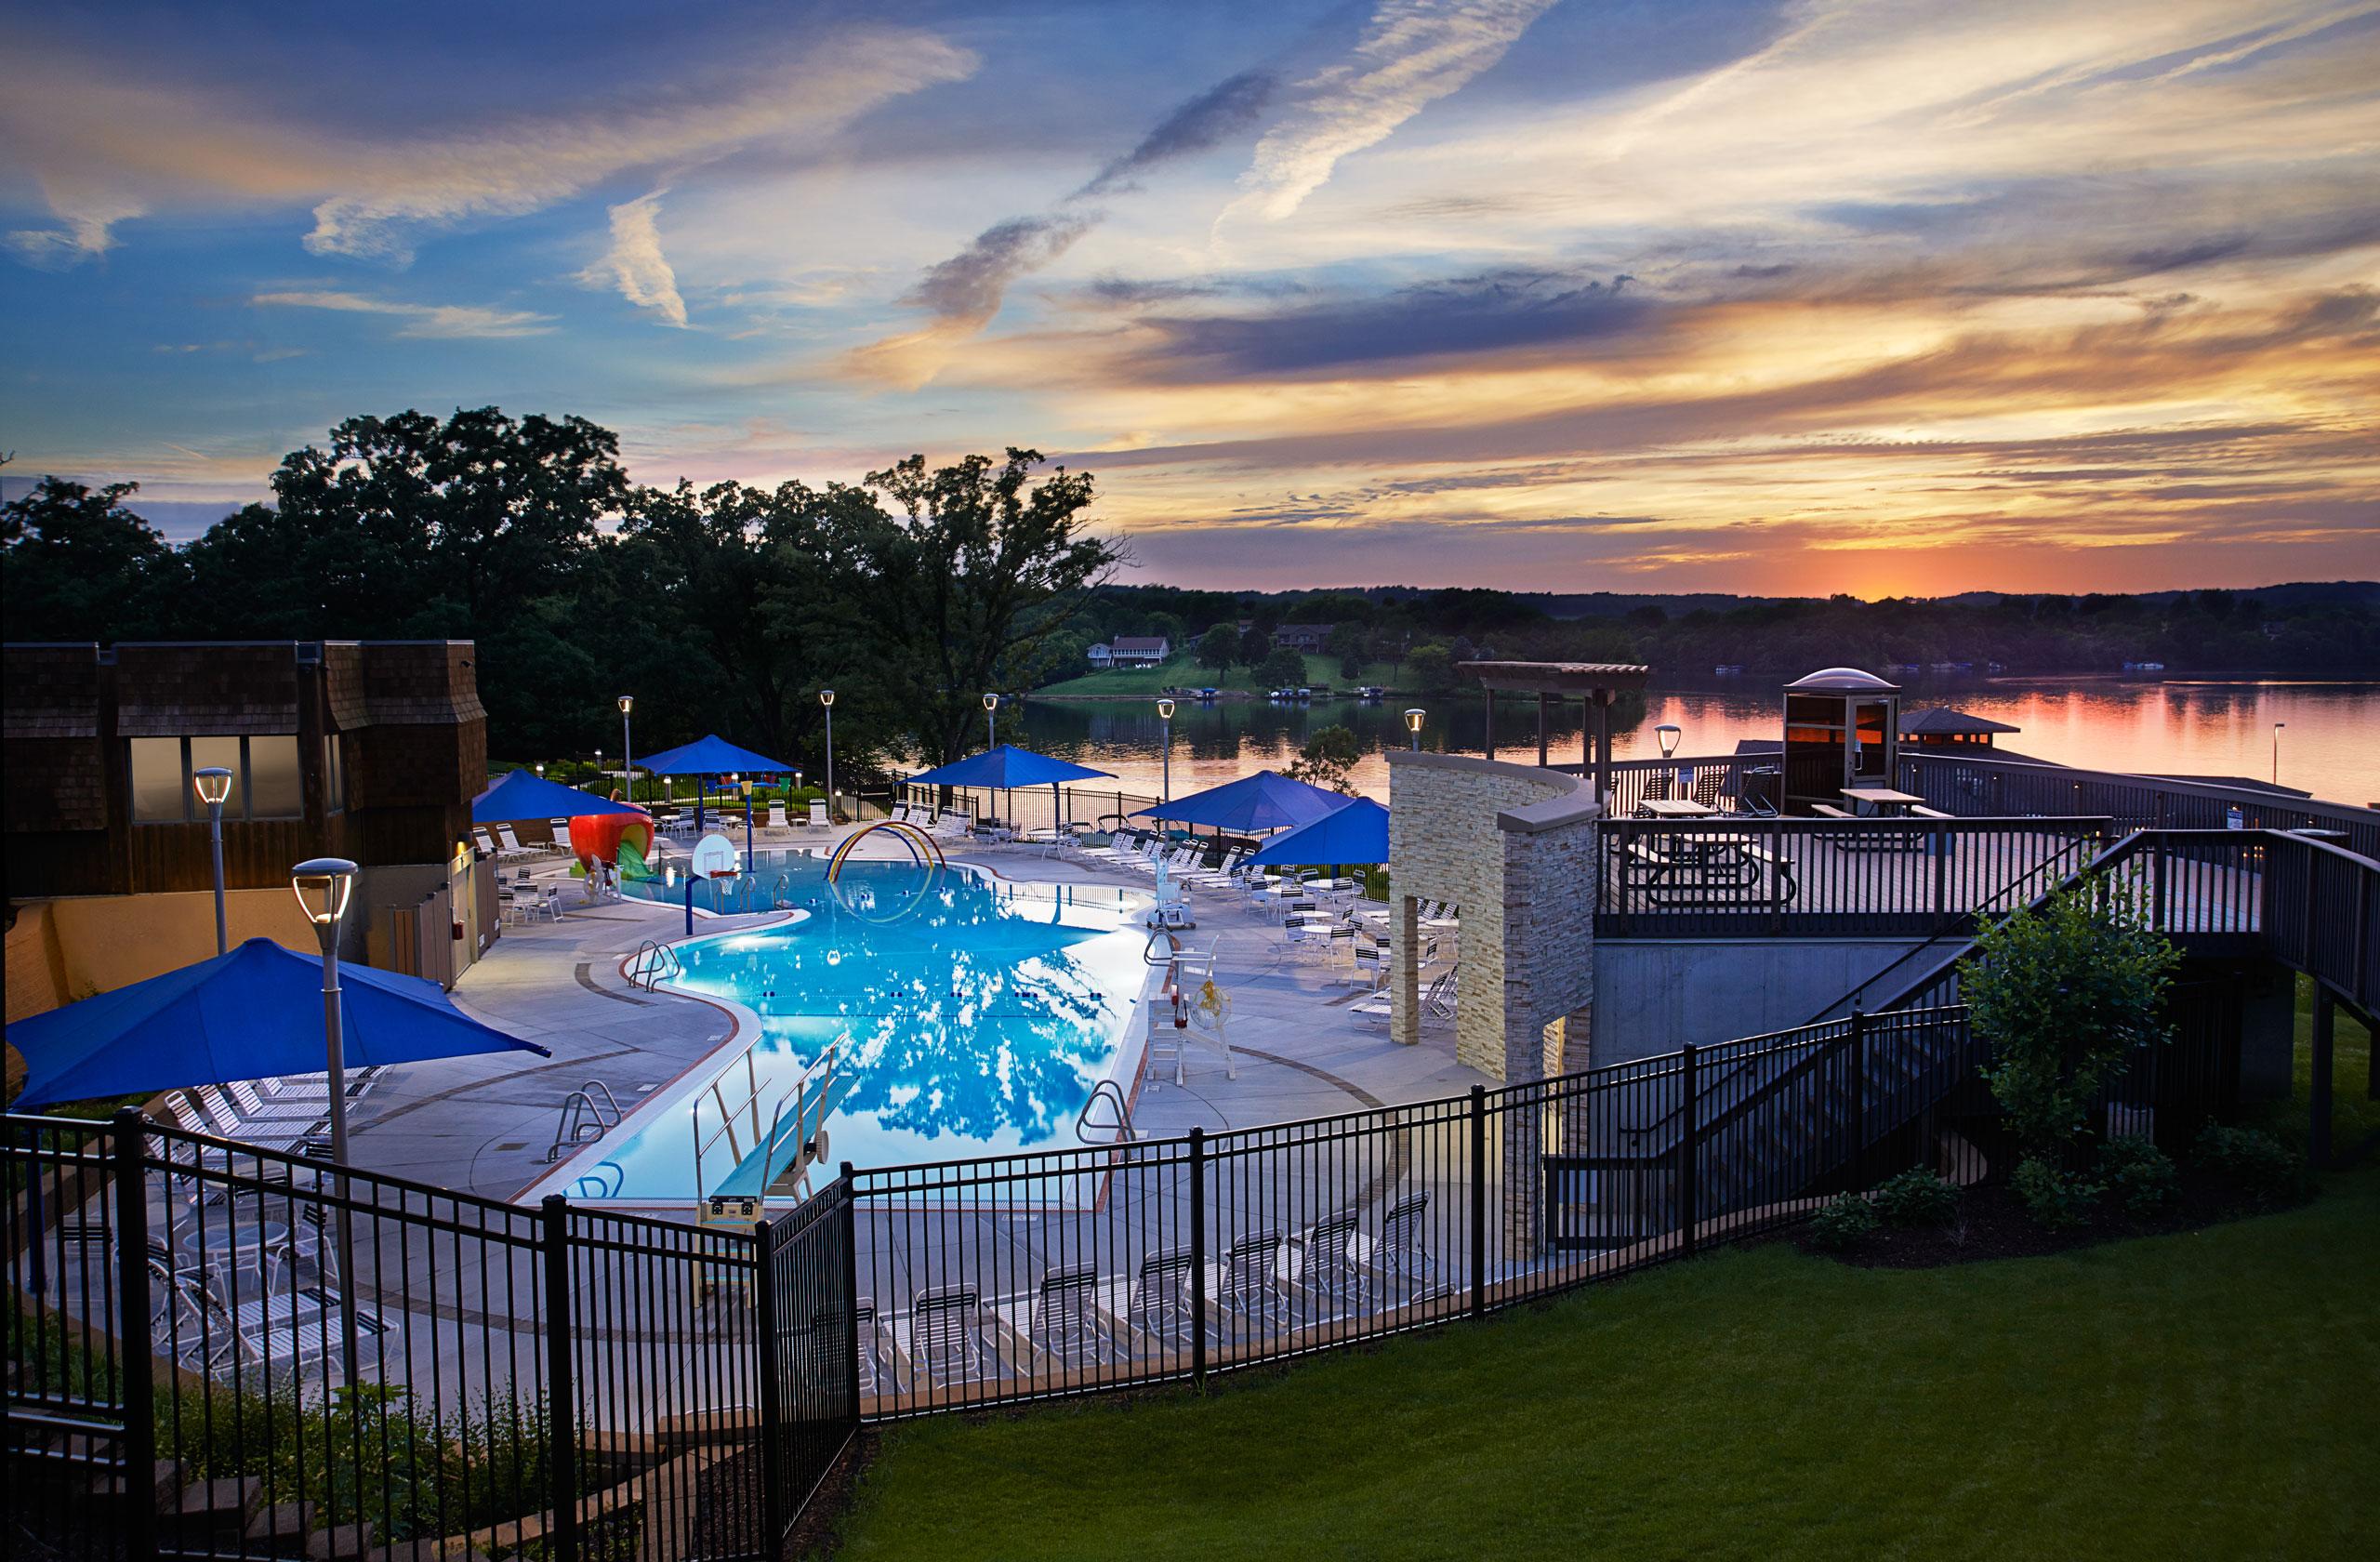 Exterior dusk swimming pool photograph